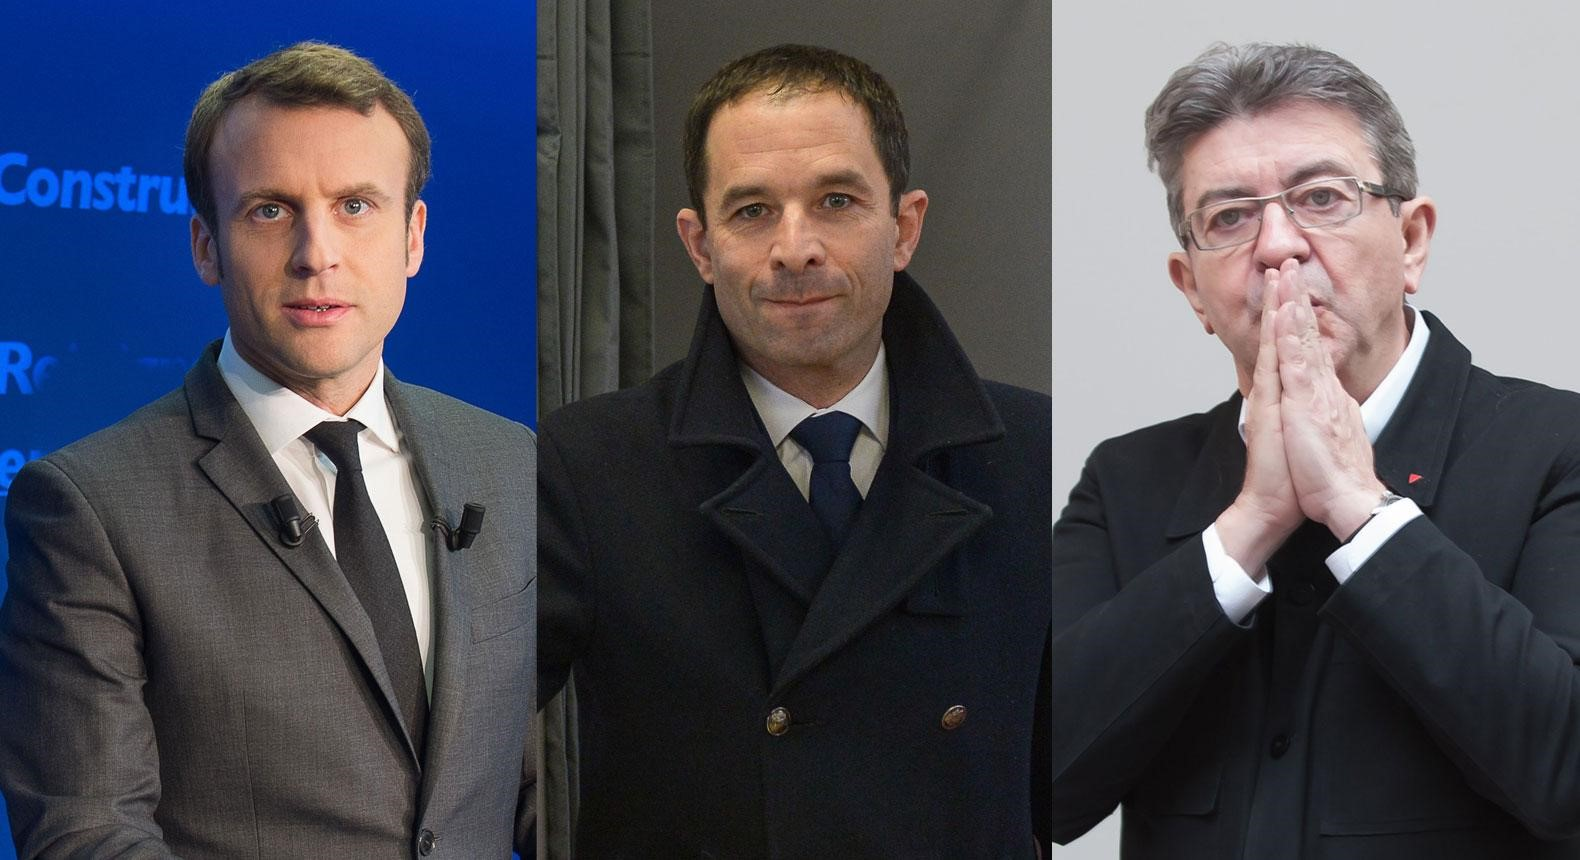 Elezioni Francia: la sinistra francese da Macron a Mélenchon